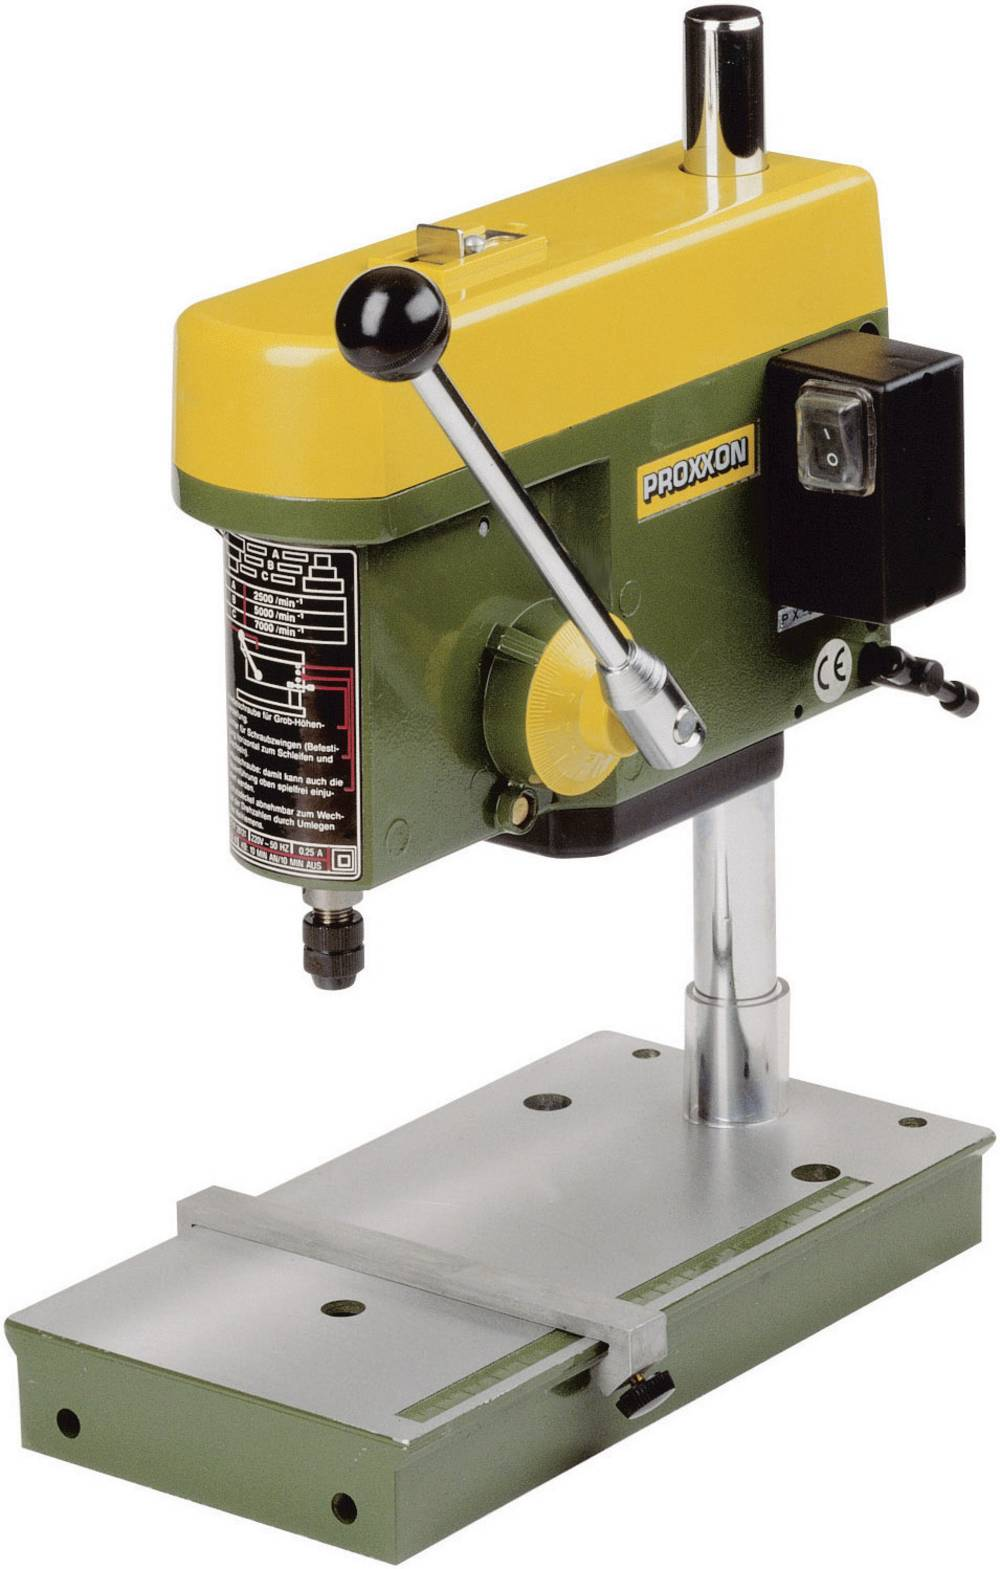 Proxxon Micromot Tbm 220 Bench Drill Press 85 W 2 From